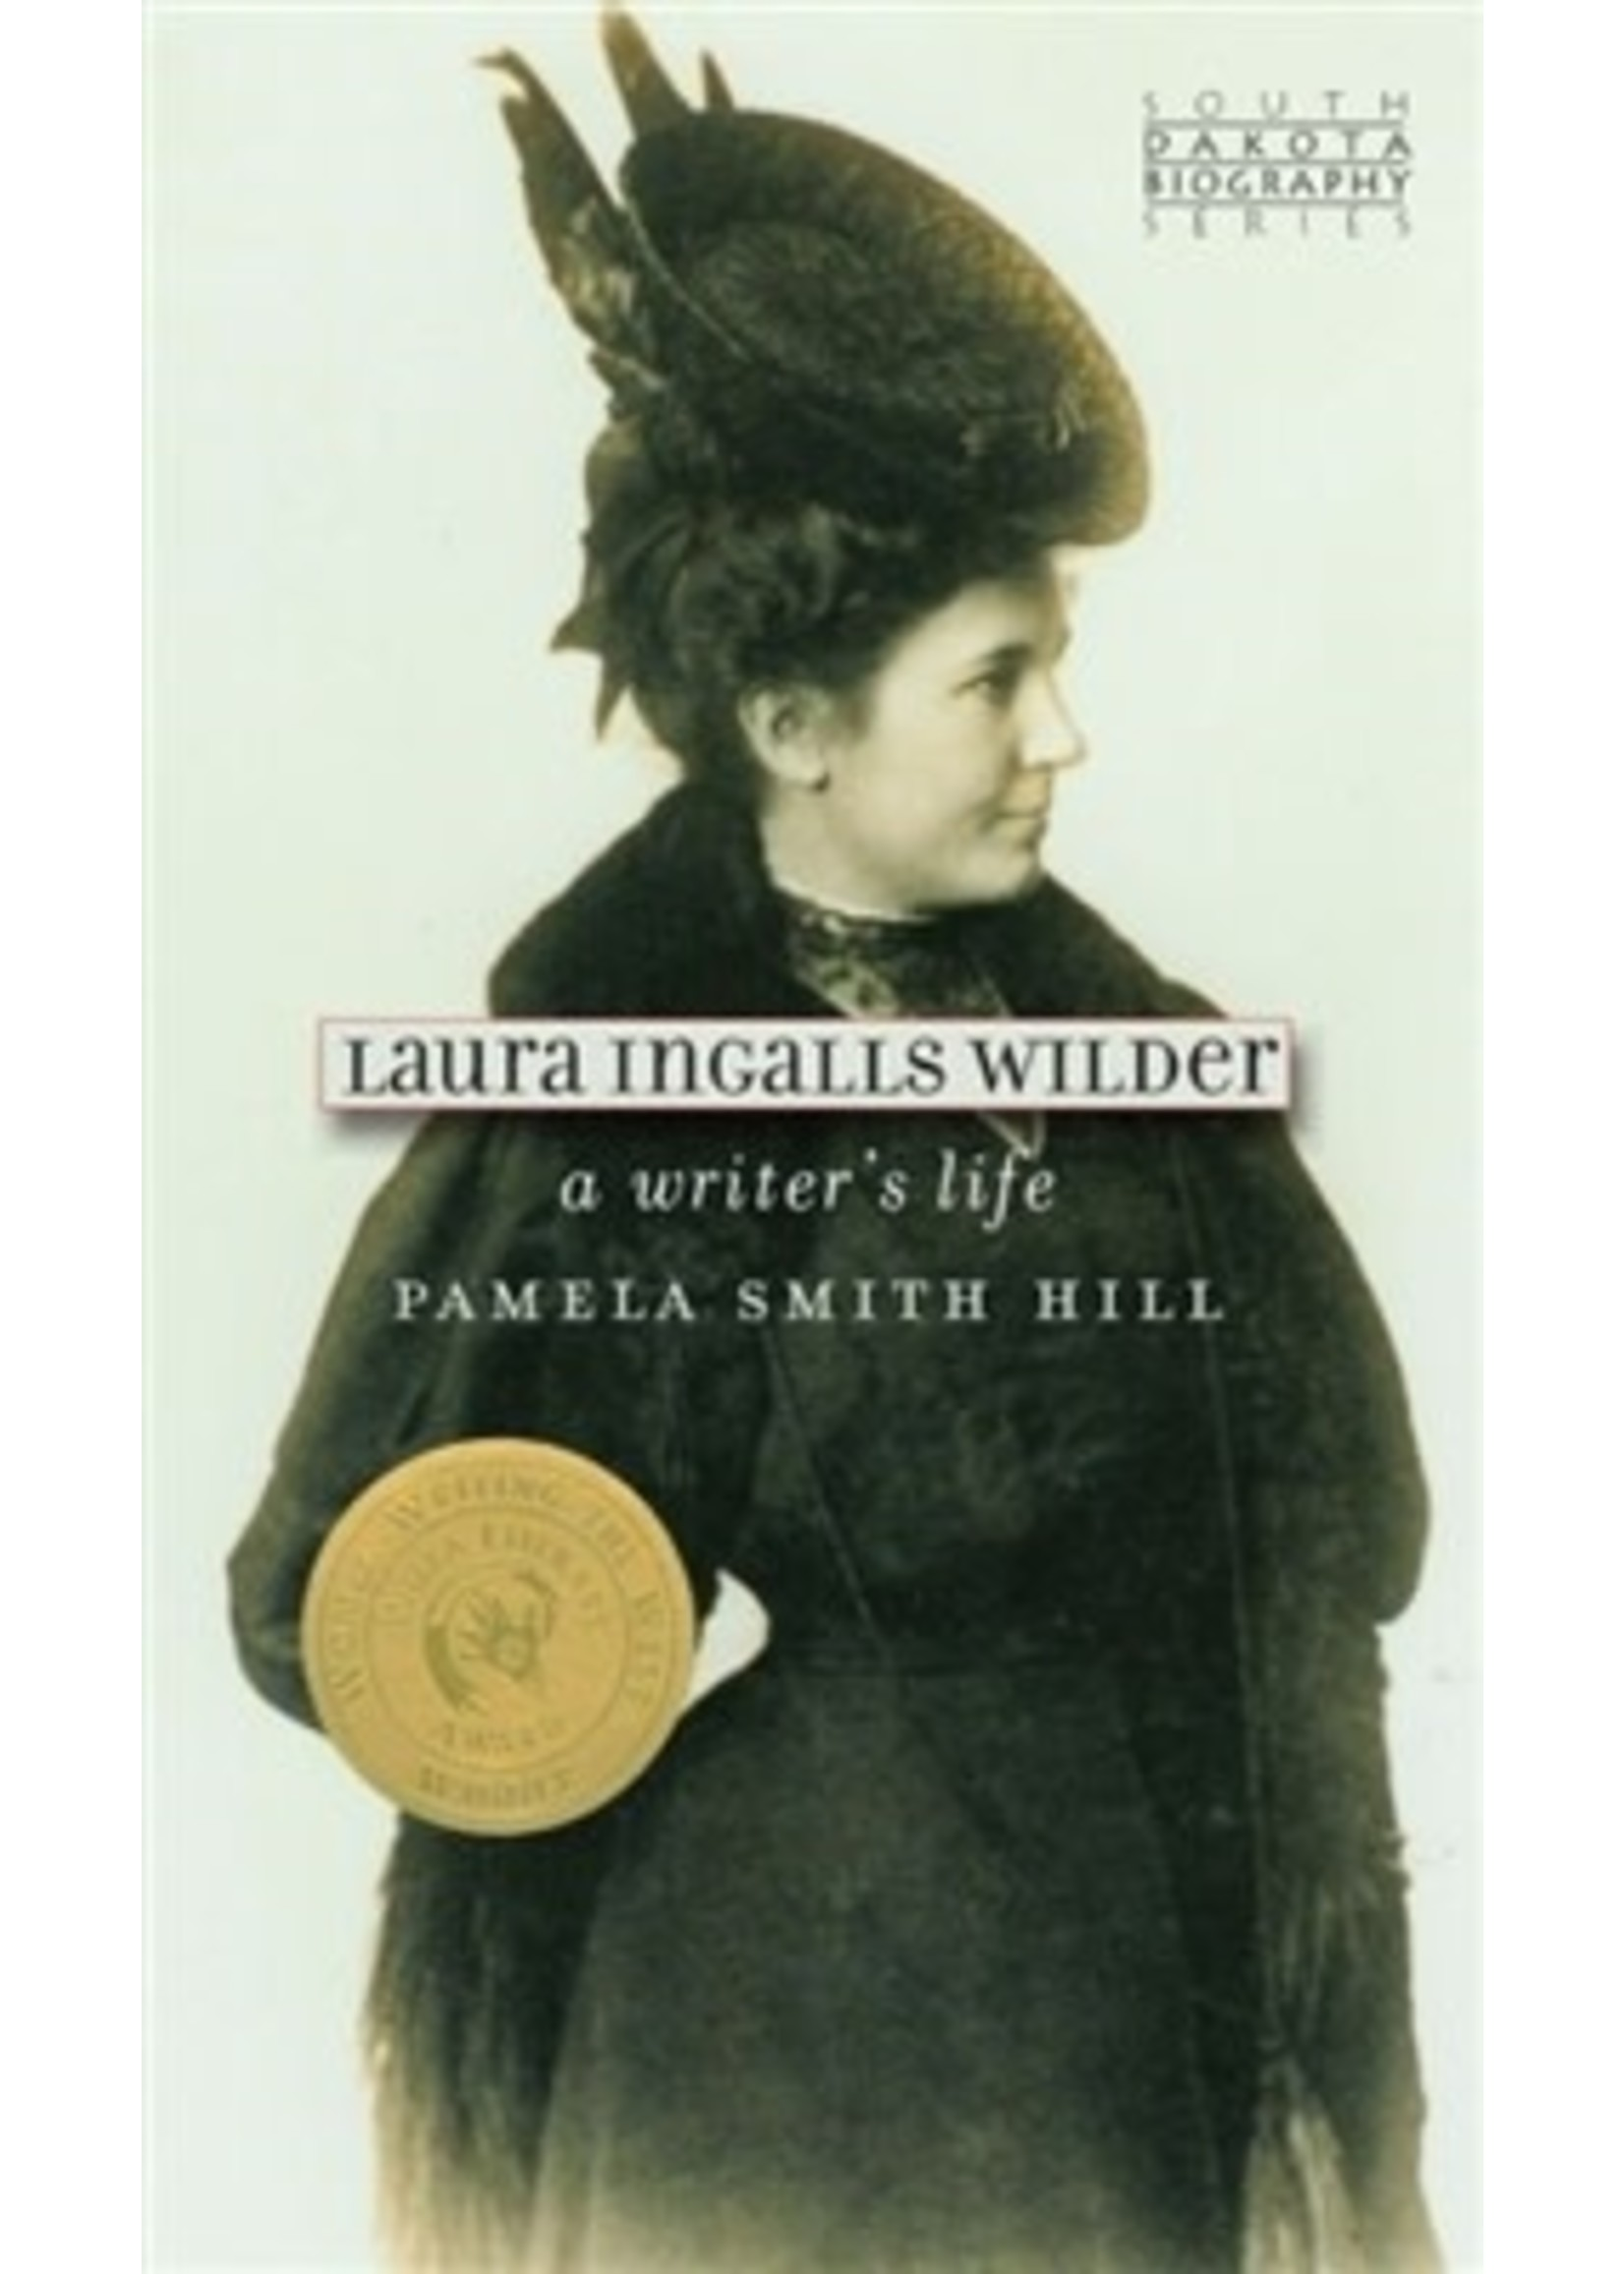 Laura Ingalls Wilder: A Writers Life